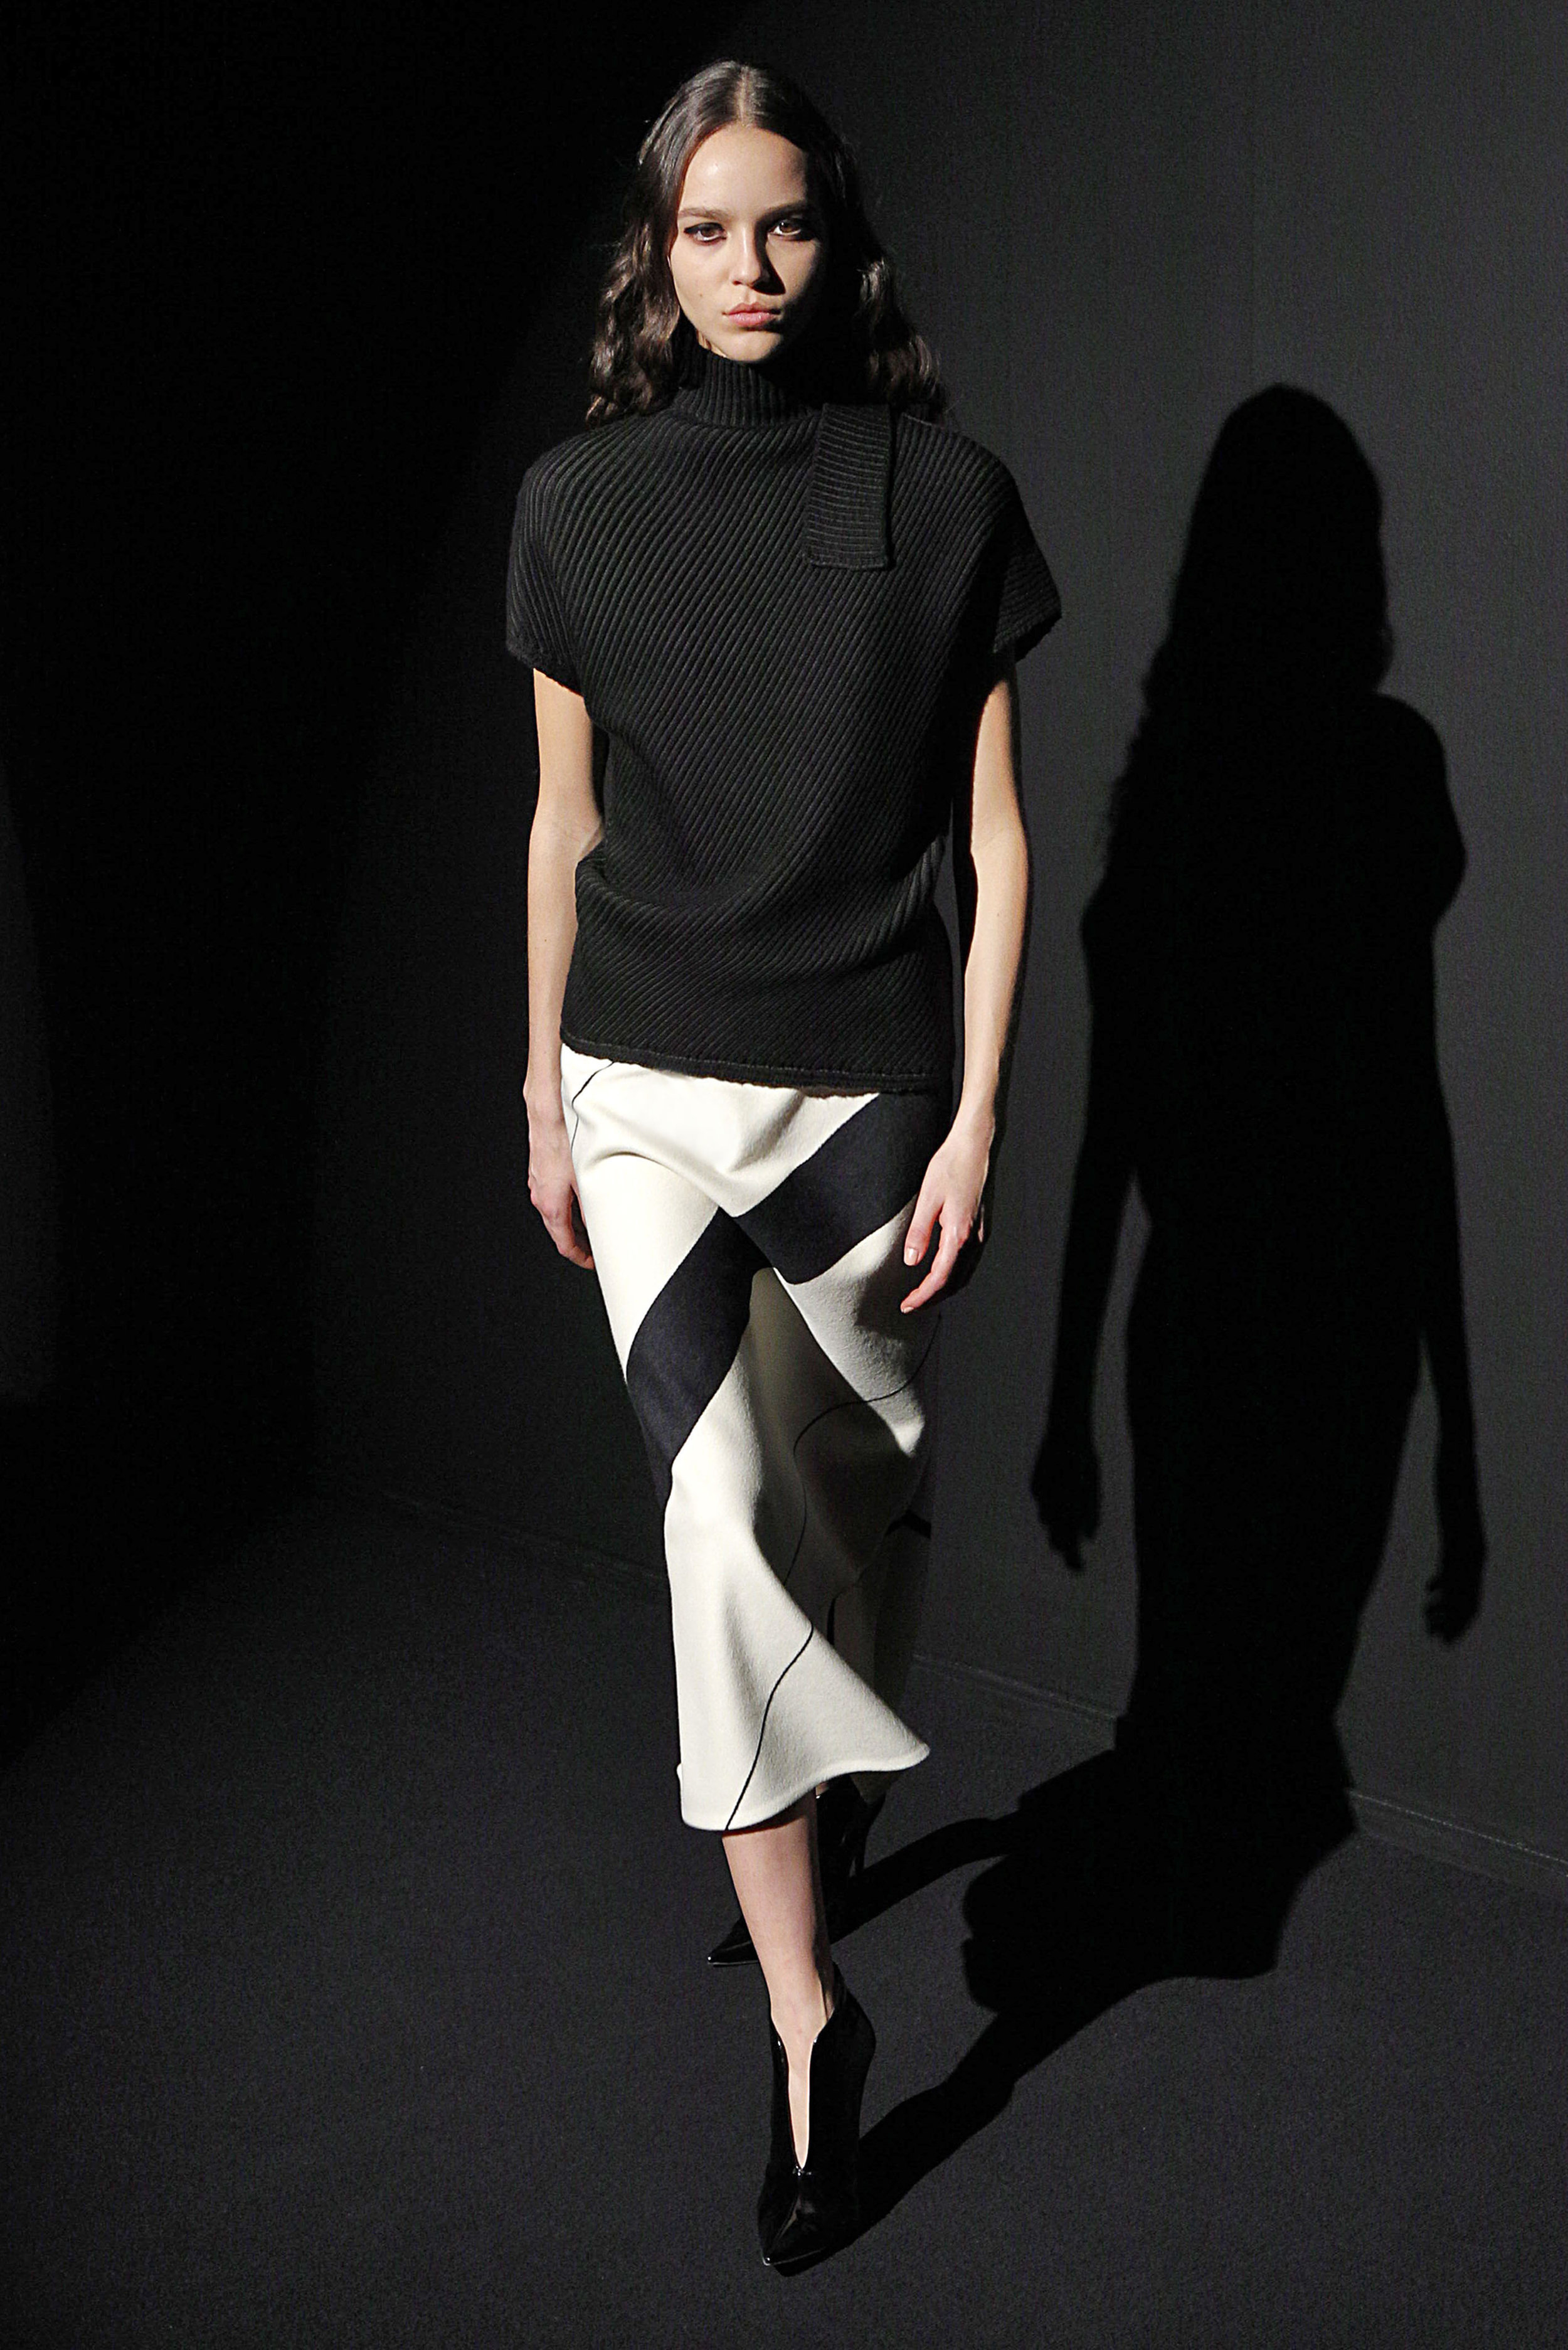 Look 11 Moss/black sweater with white/black stripe wool skirt.